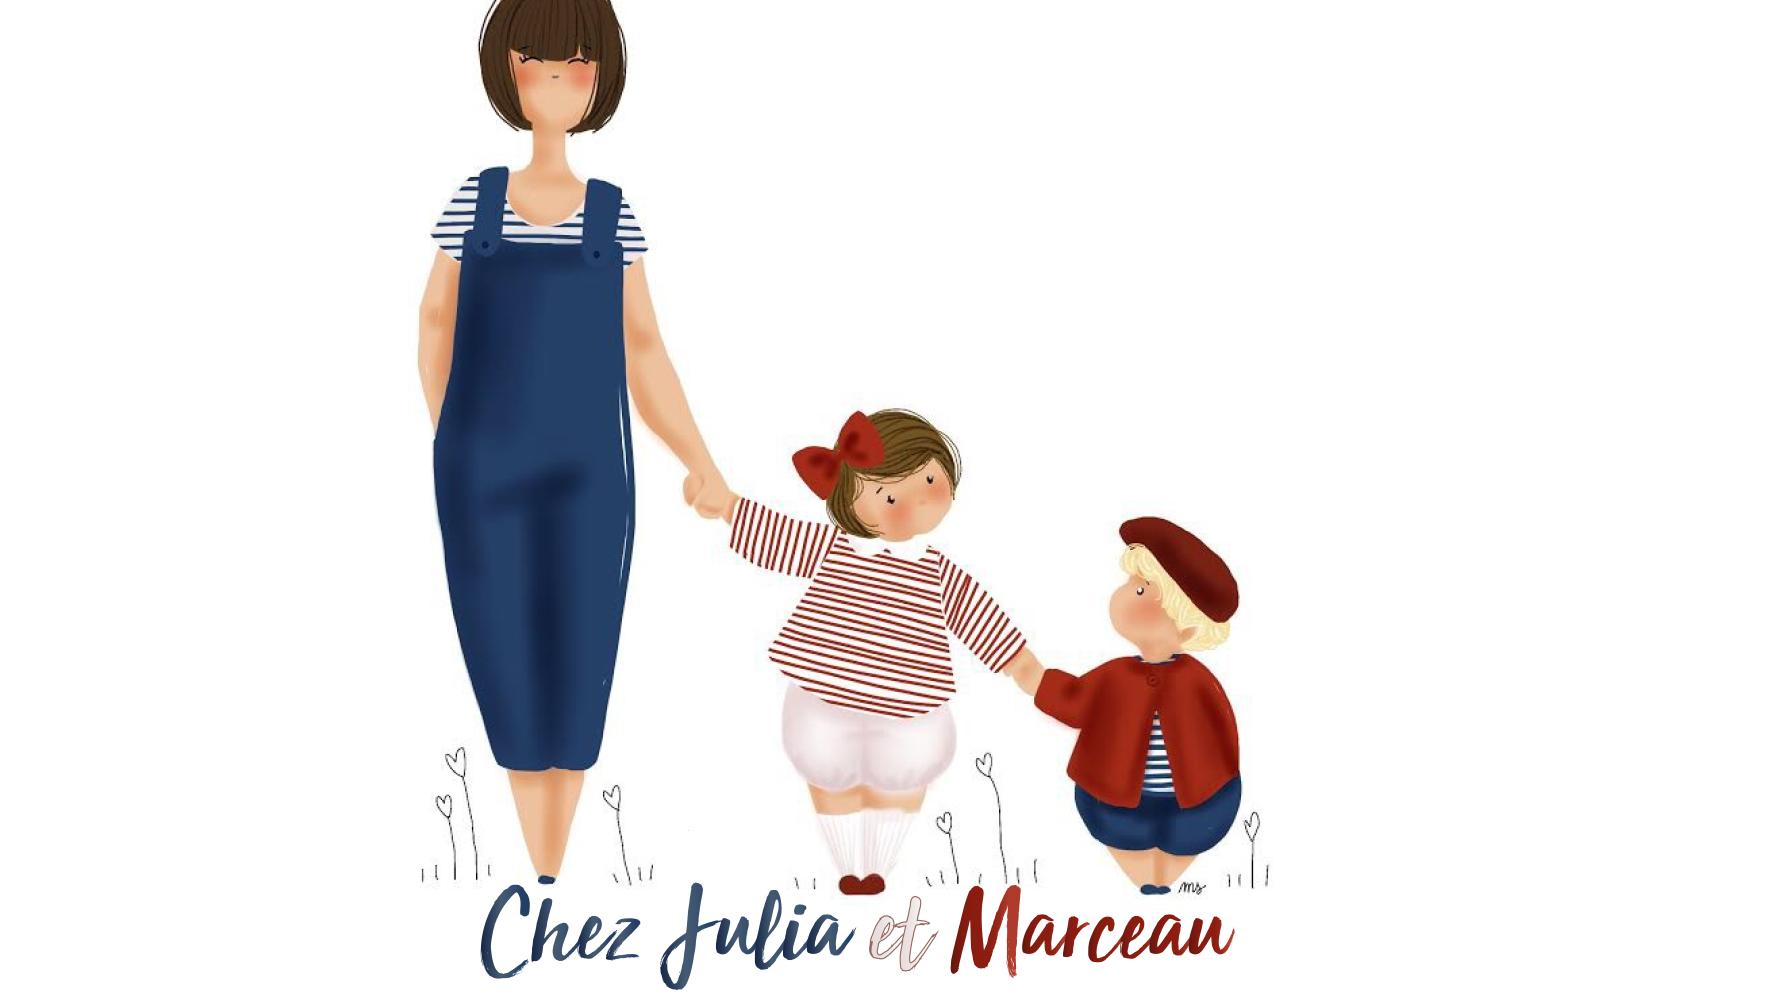 LOGO_-_Chez_Julia_et_Marceau-1523900536.jpg